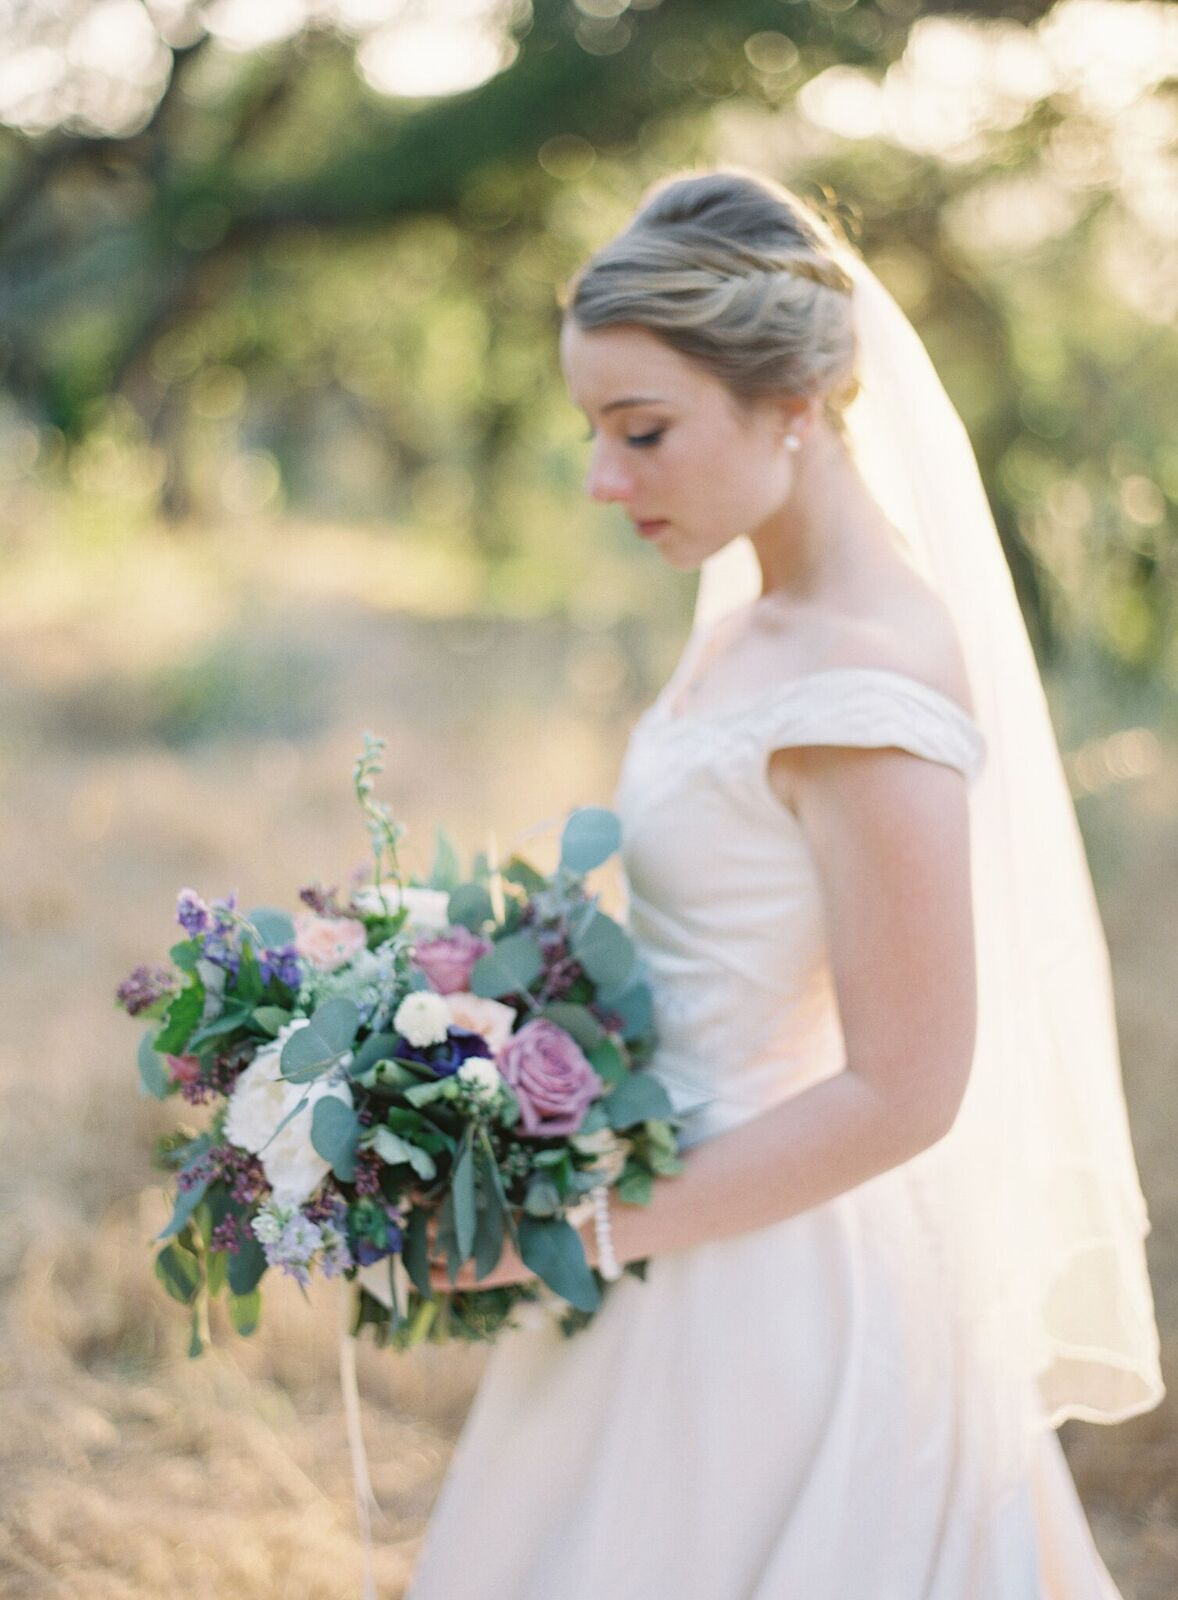 genny-aaron-wedding-burlap-and-bordeaux-sara-wier-photography-43_preview.jpg